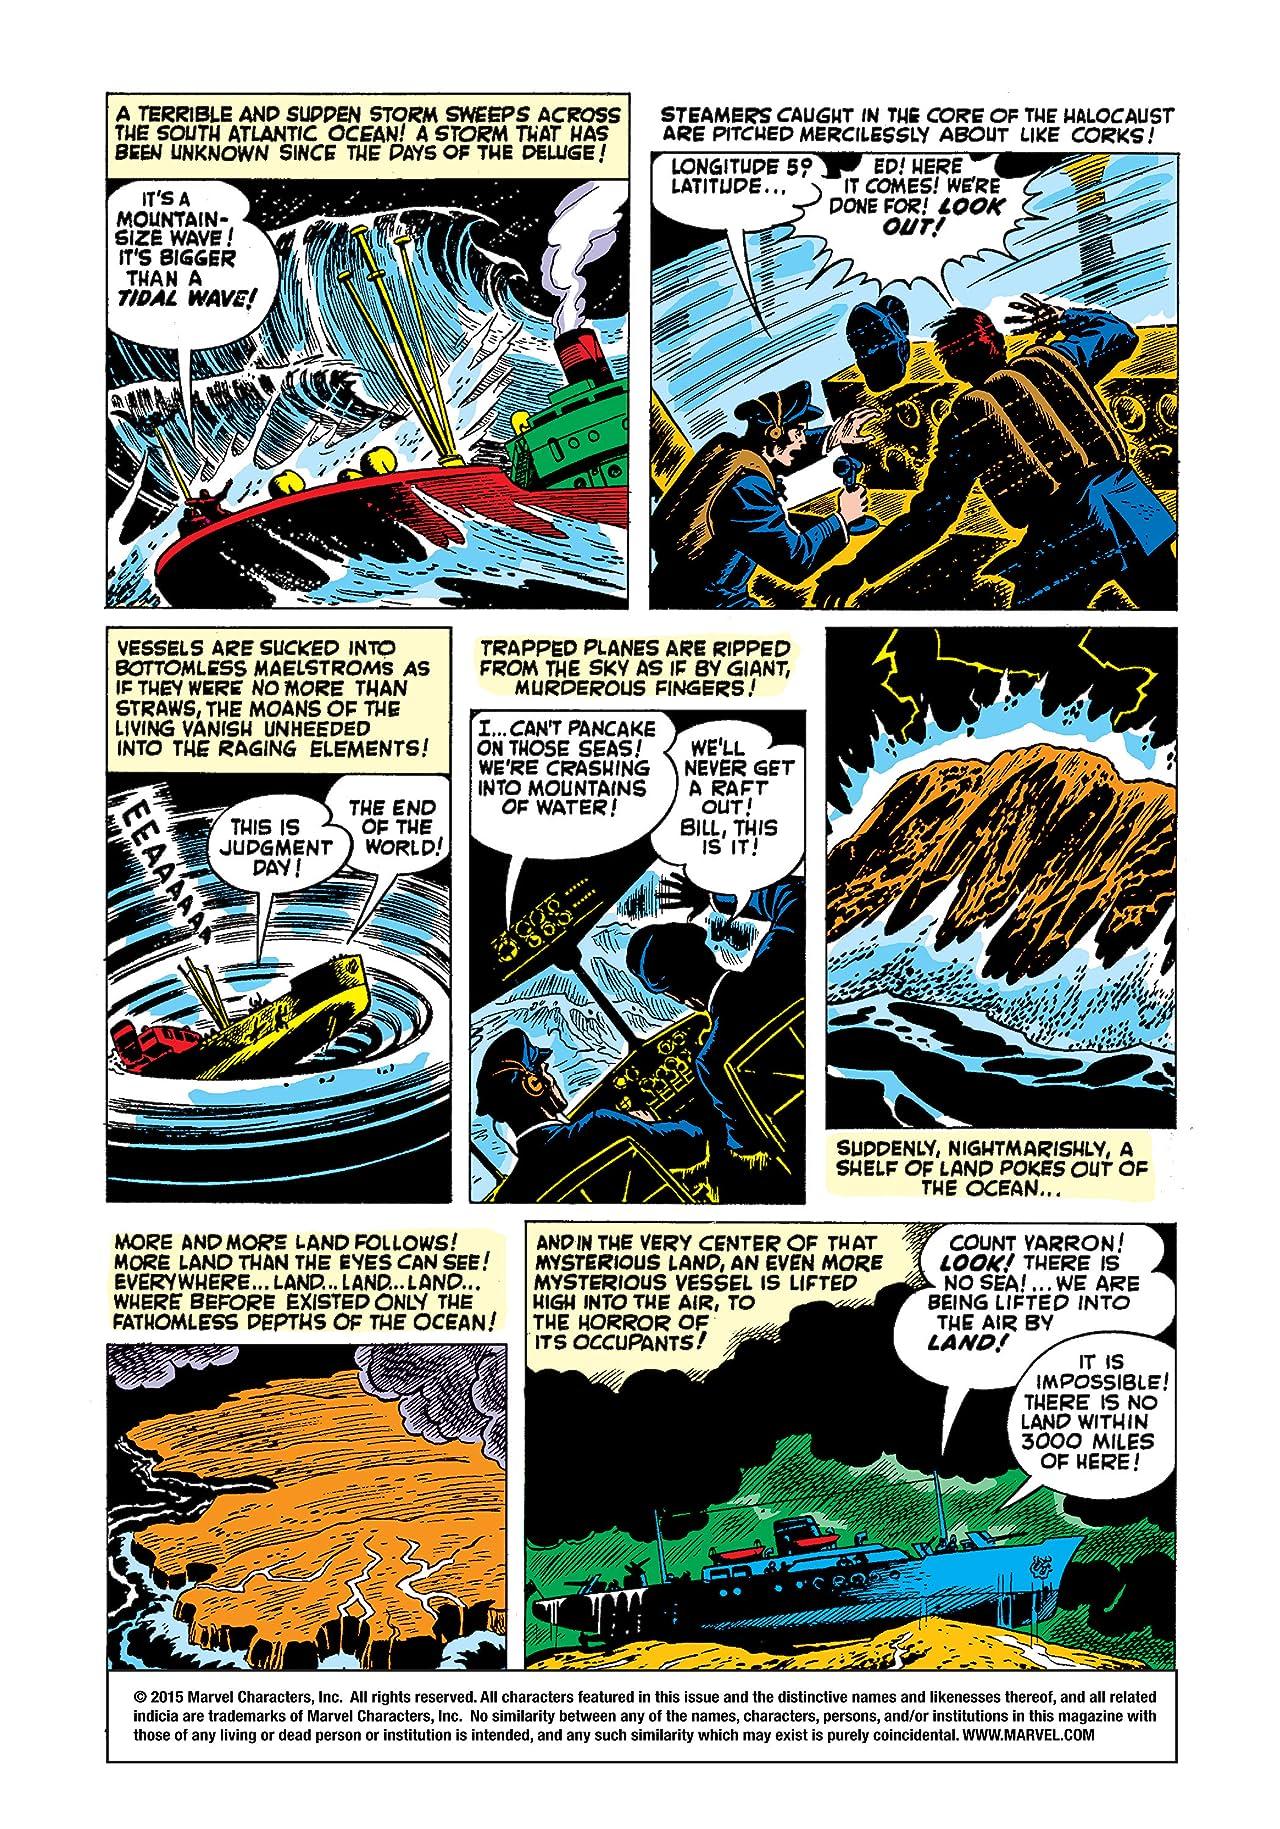 Marvel Boy (1950-1951) #1